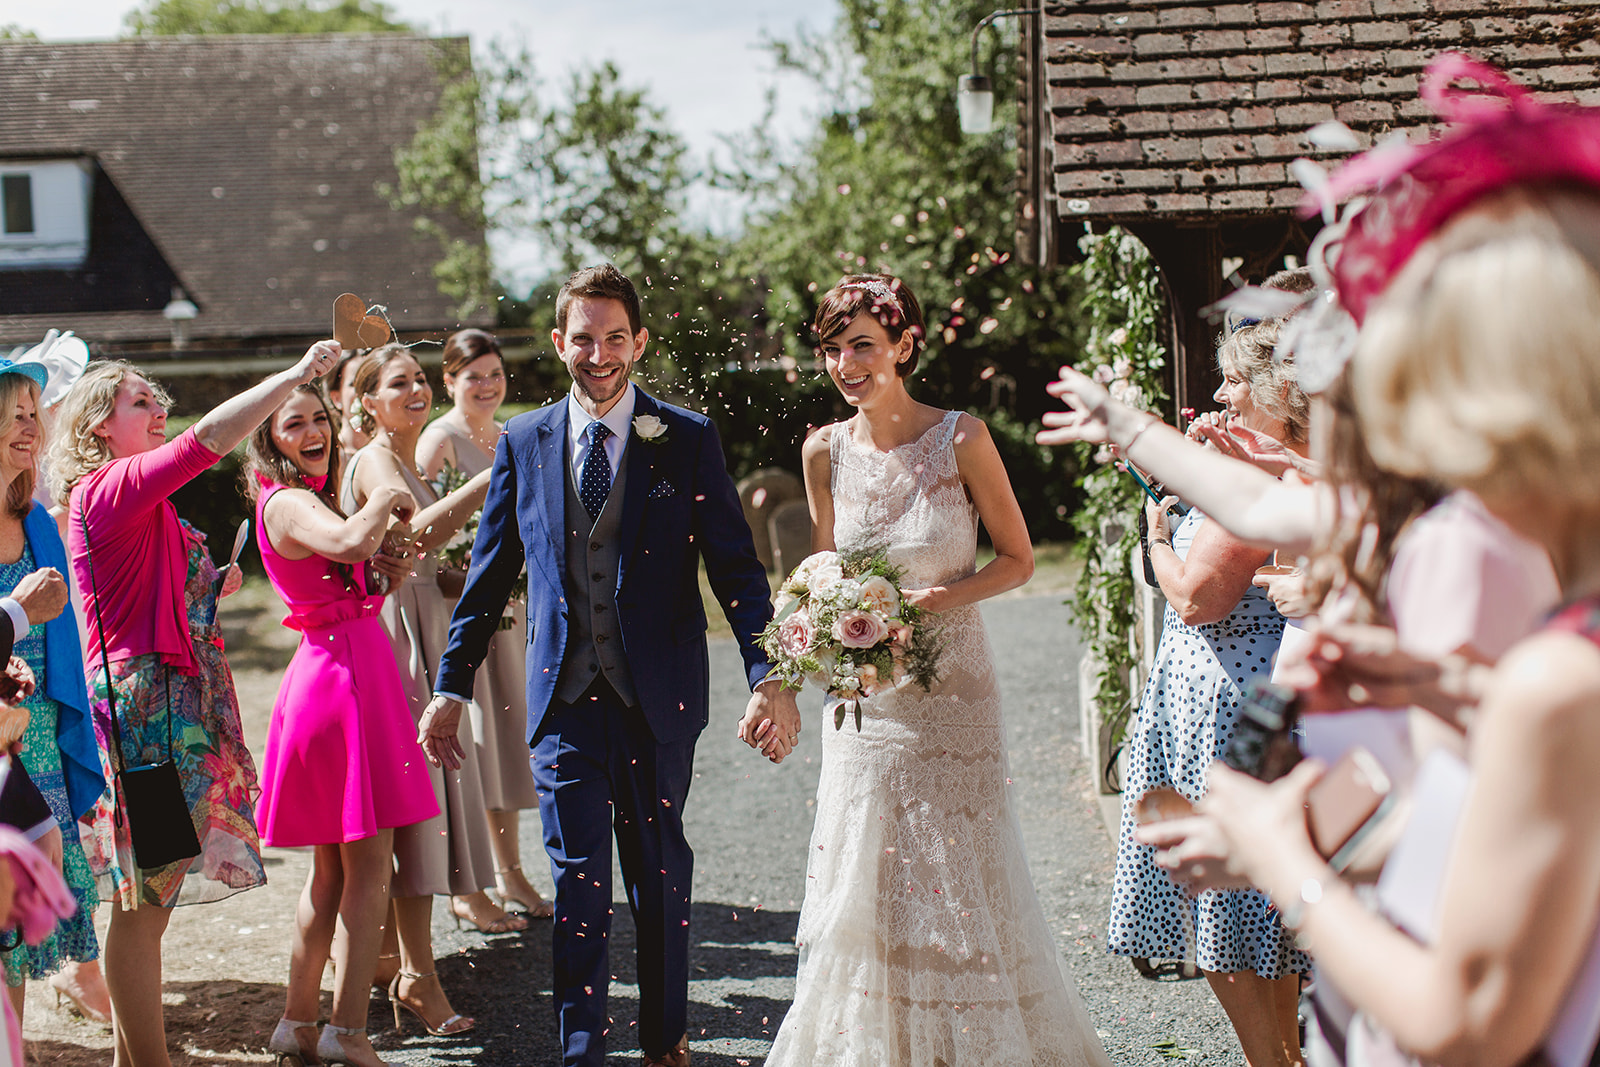 Eggington House marquee wedding_confetti shot